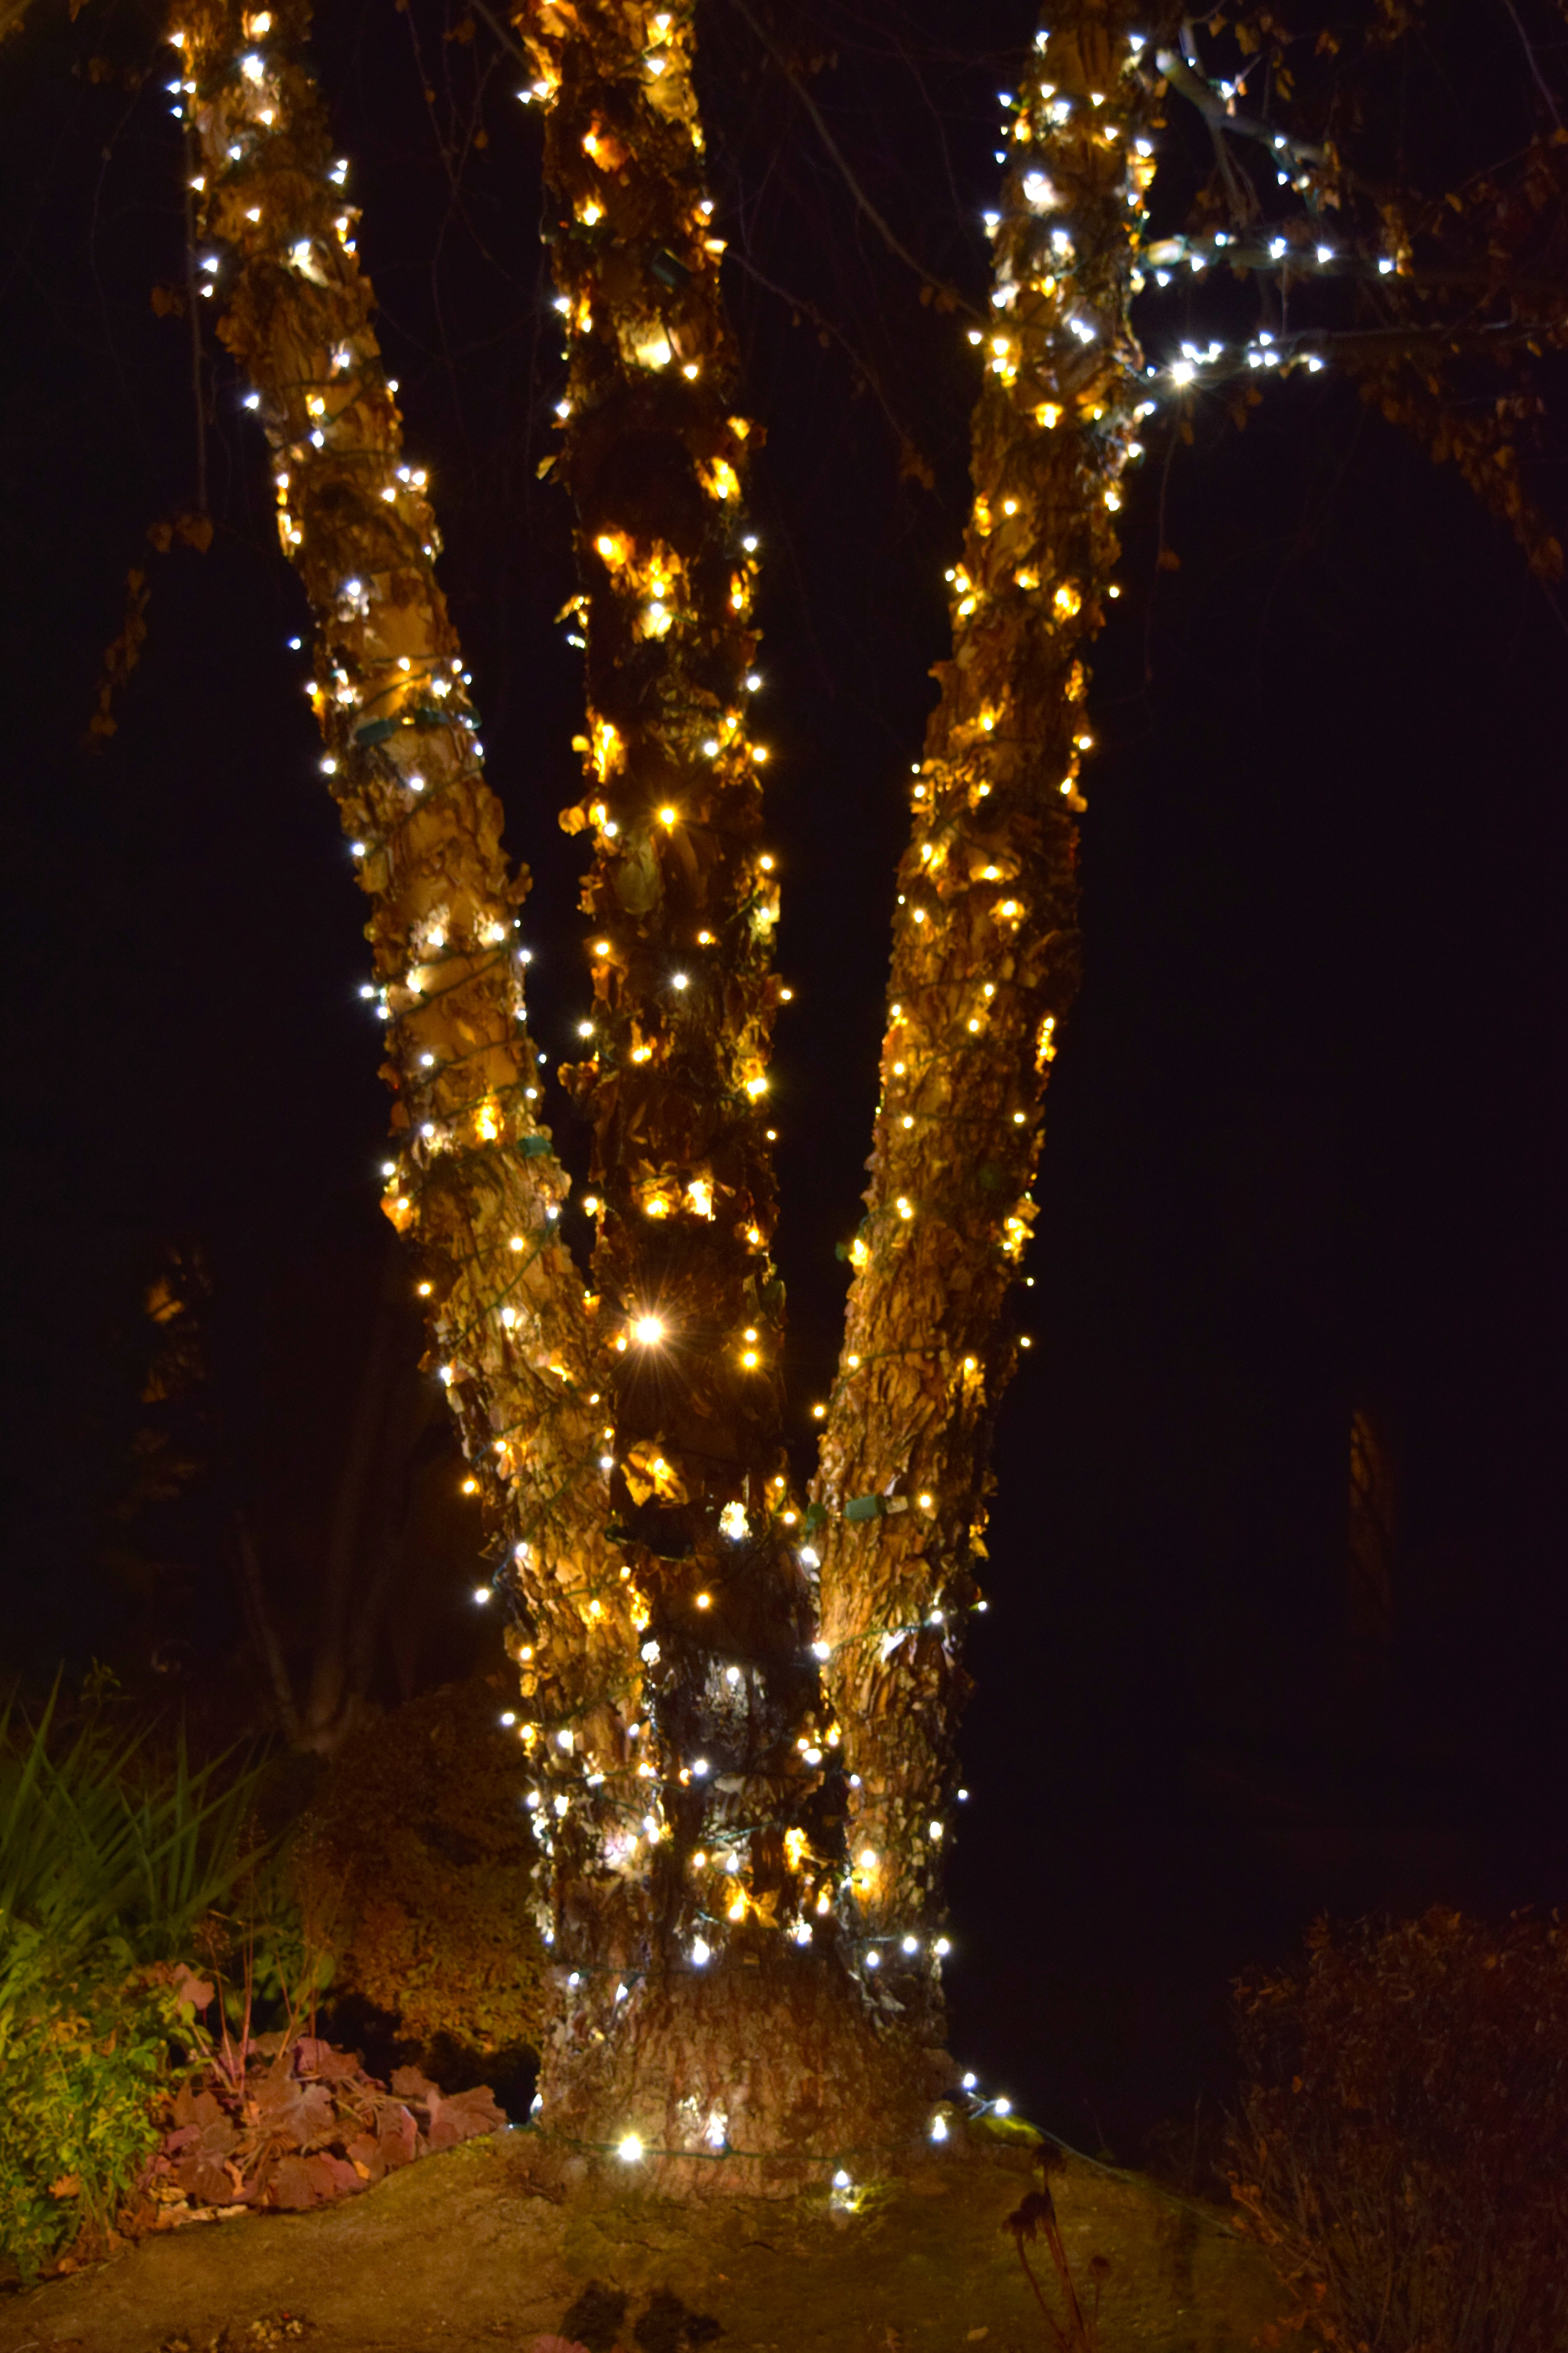 LED Christmas Lights - Tree Wrap - Warm White